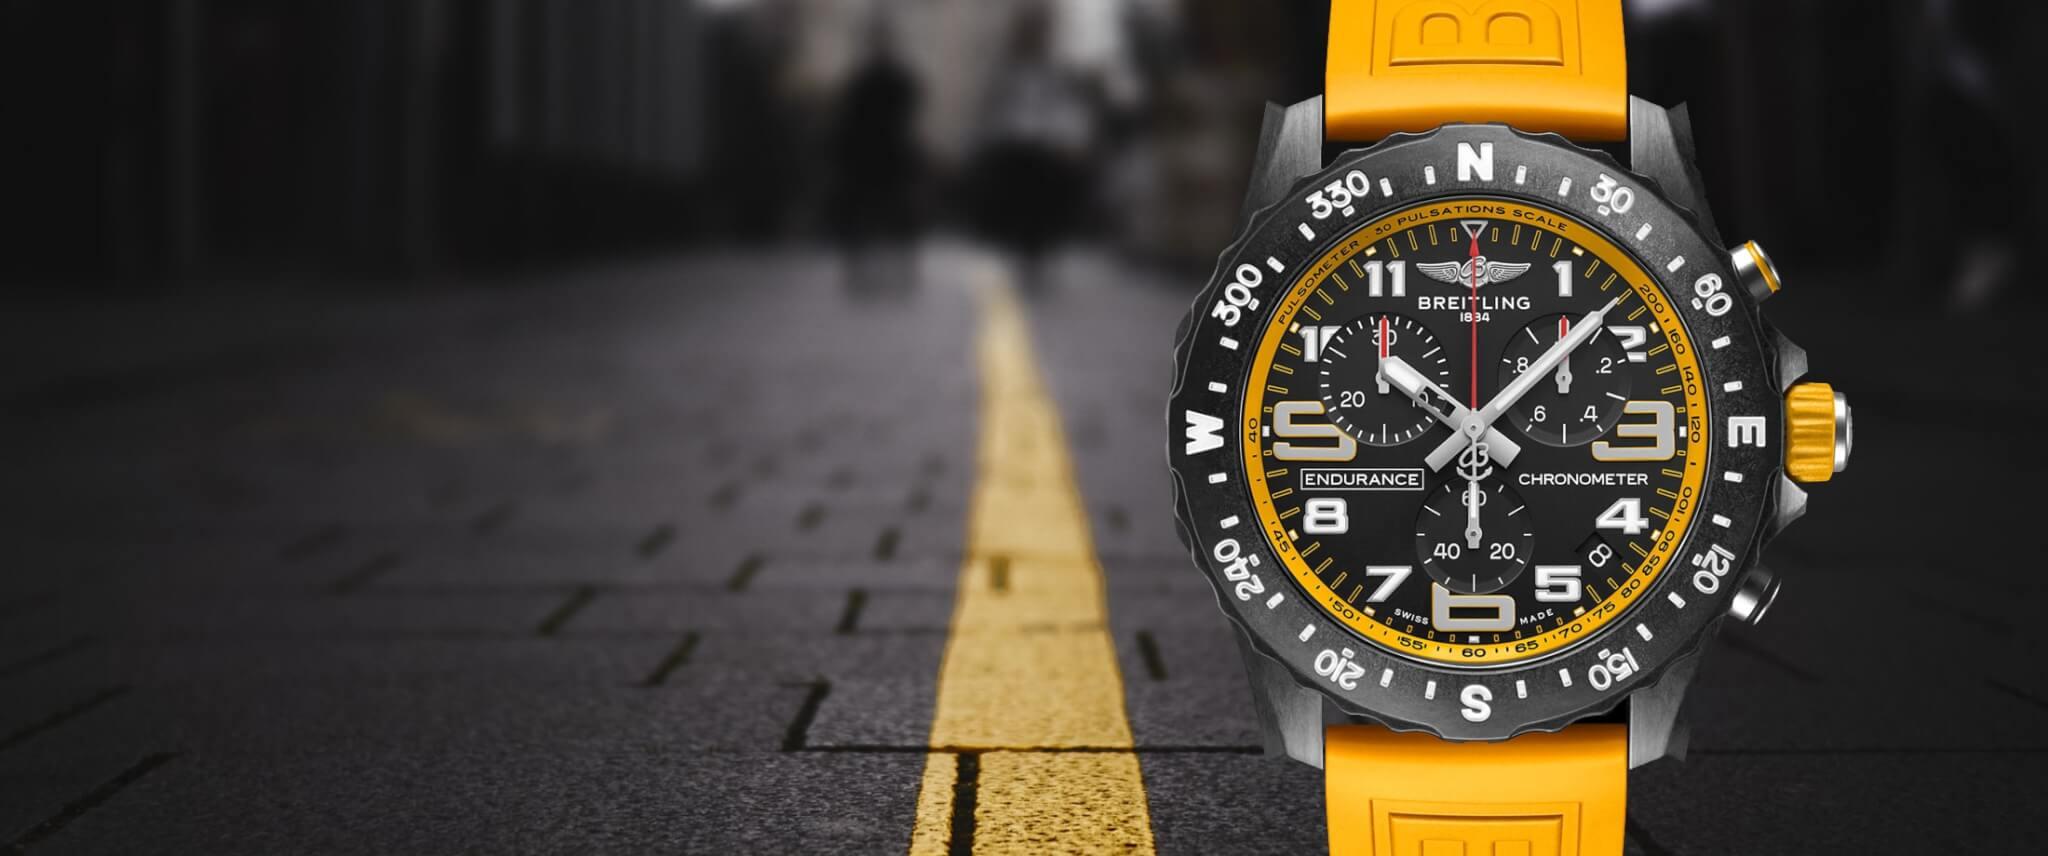 breitling yellow 2000x920-min